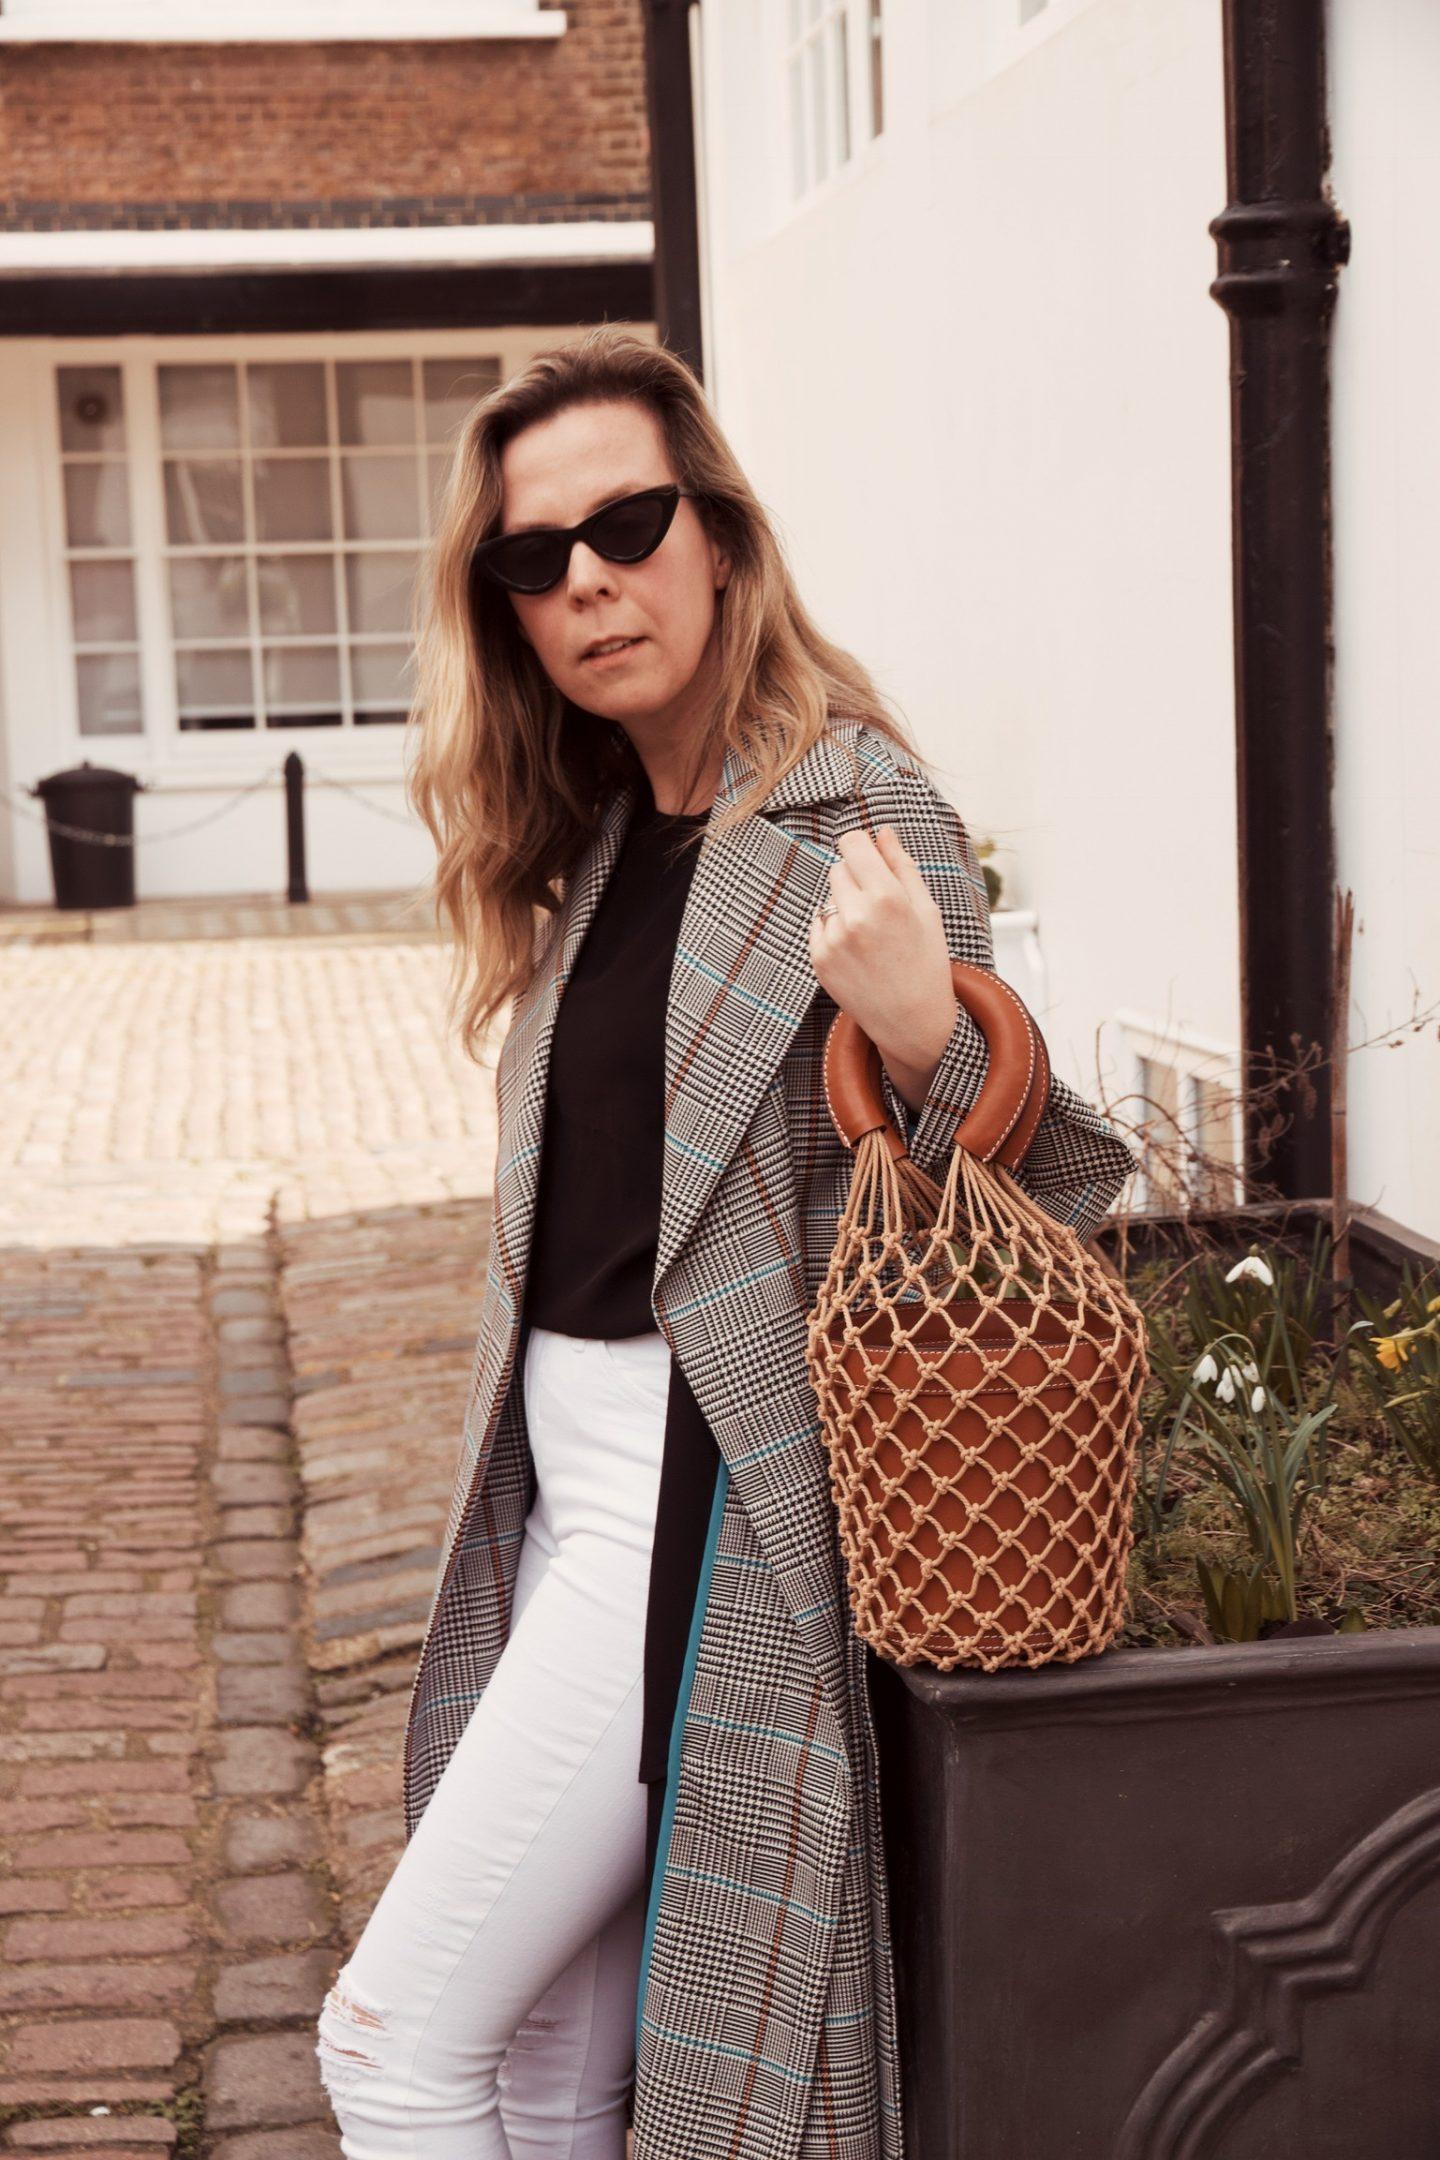 Lisa Morgan Wearing Topshop Checked Trench Coat and Staud Bucket Bag